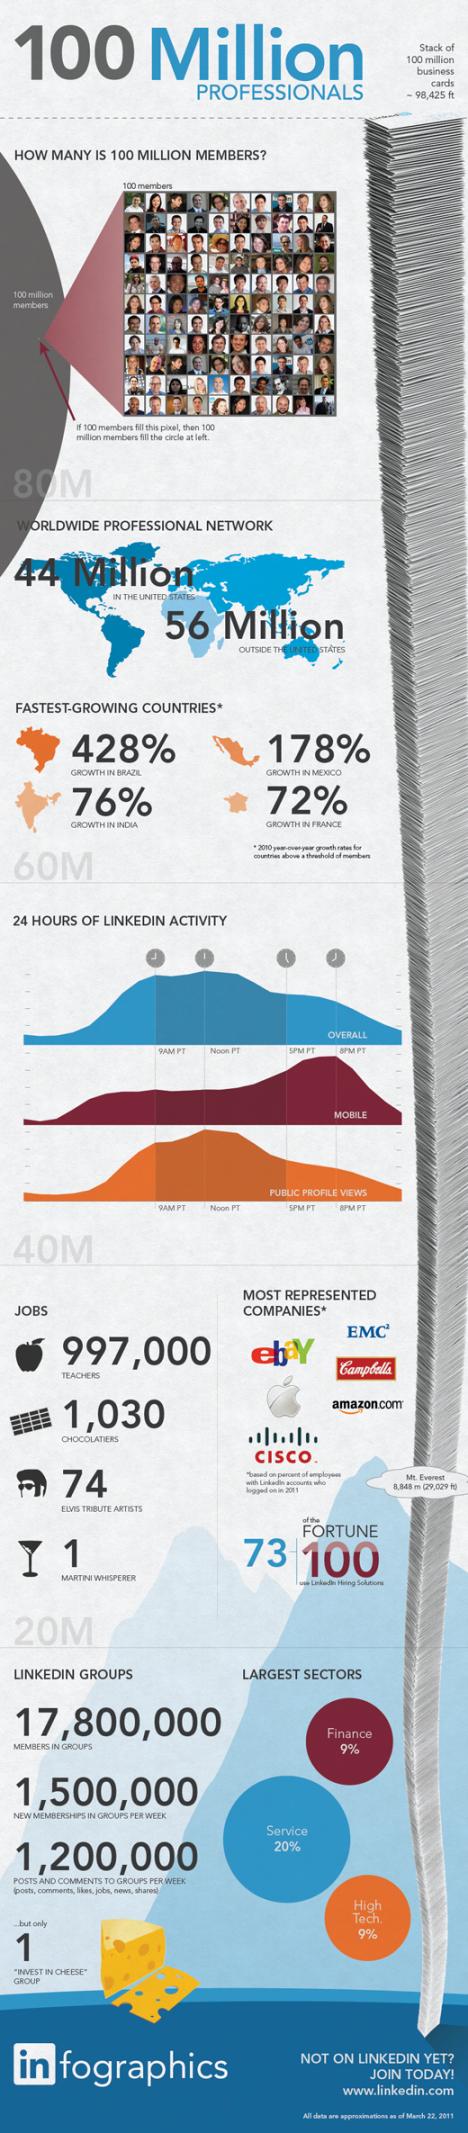 LinkedIn Infographic-460